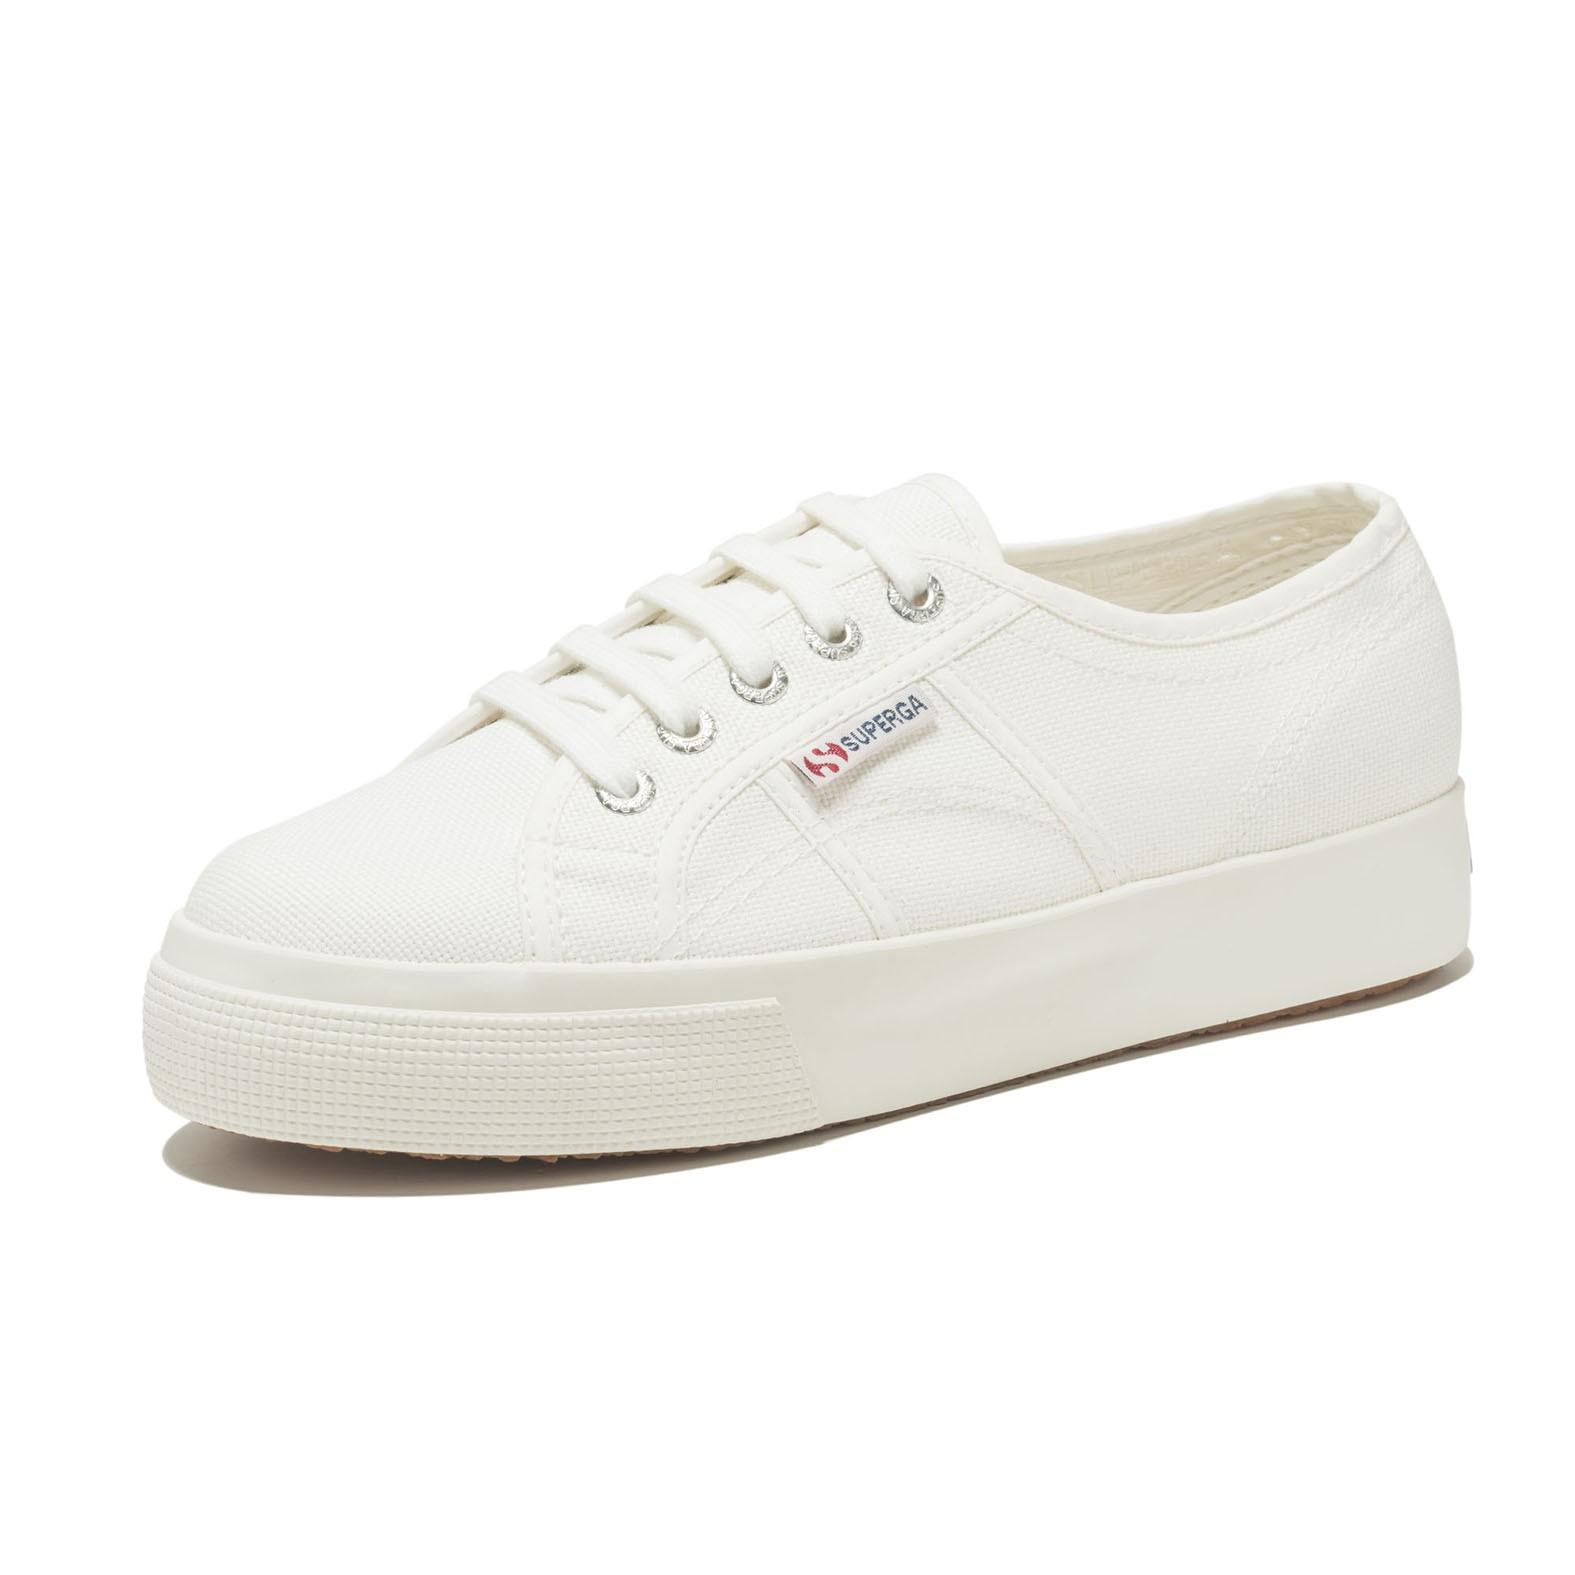 2730 COTU CLASSIC WHITE